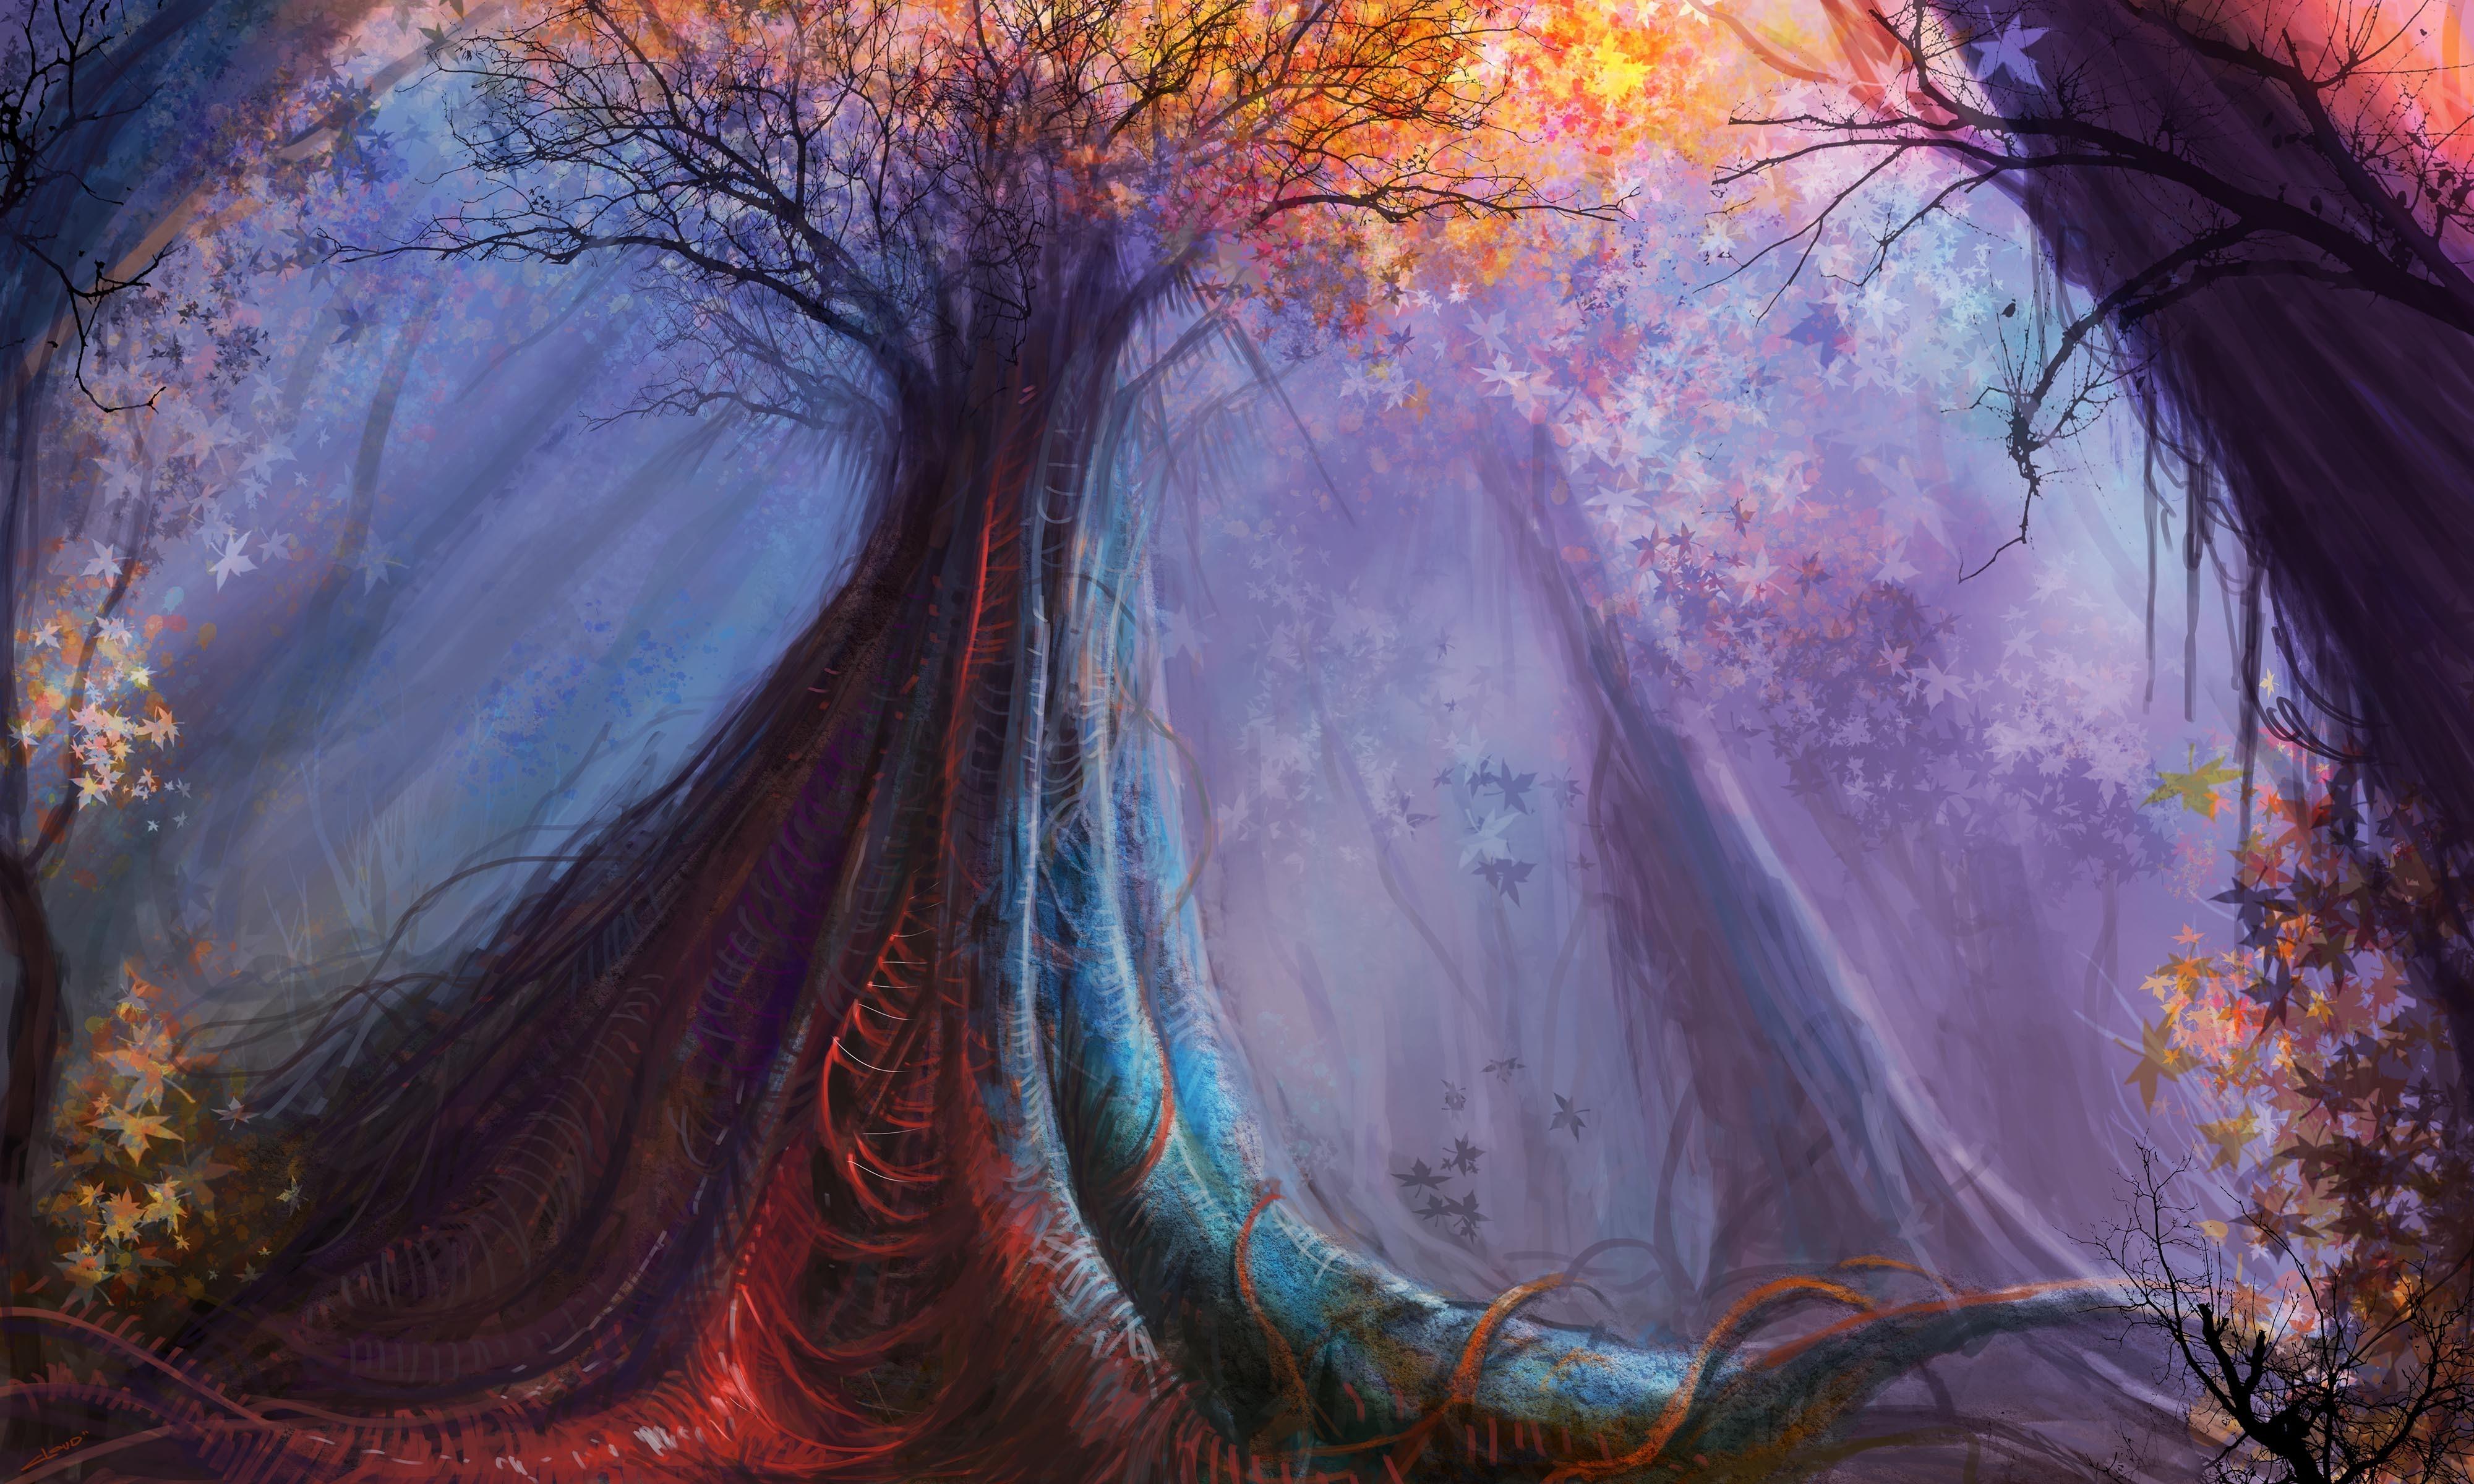 Fantasy - Forest  Tree Fantasy Artistic Fall Leaf Wallpaper